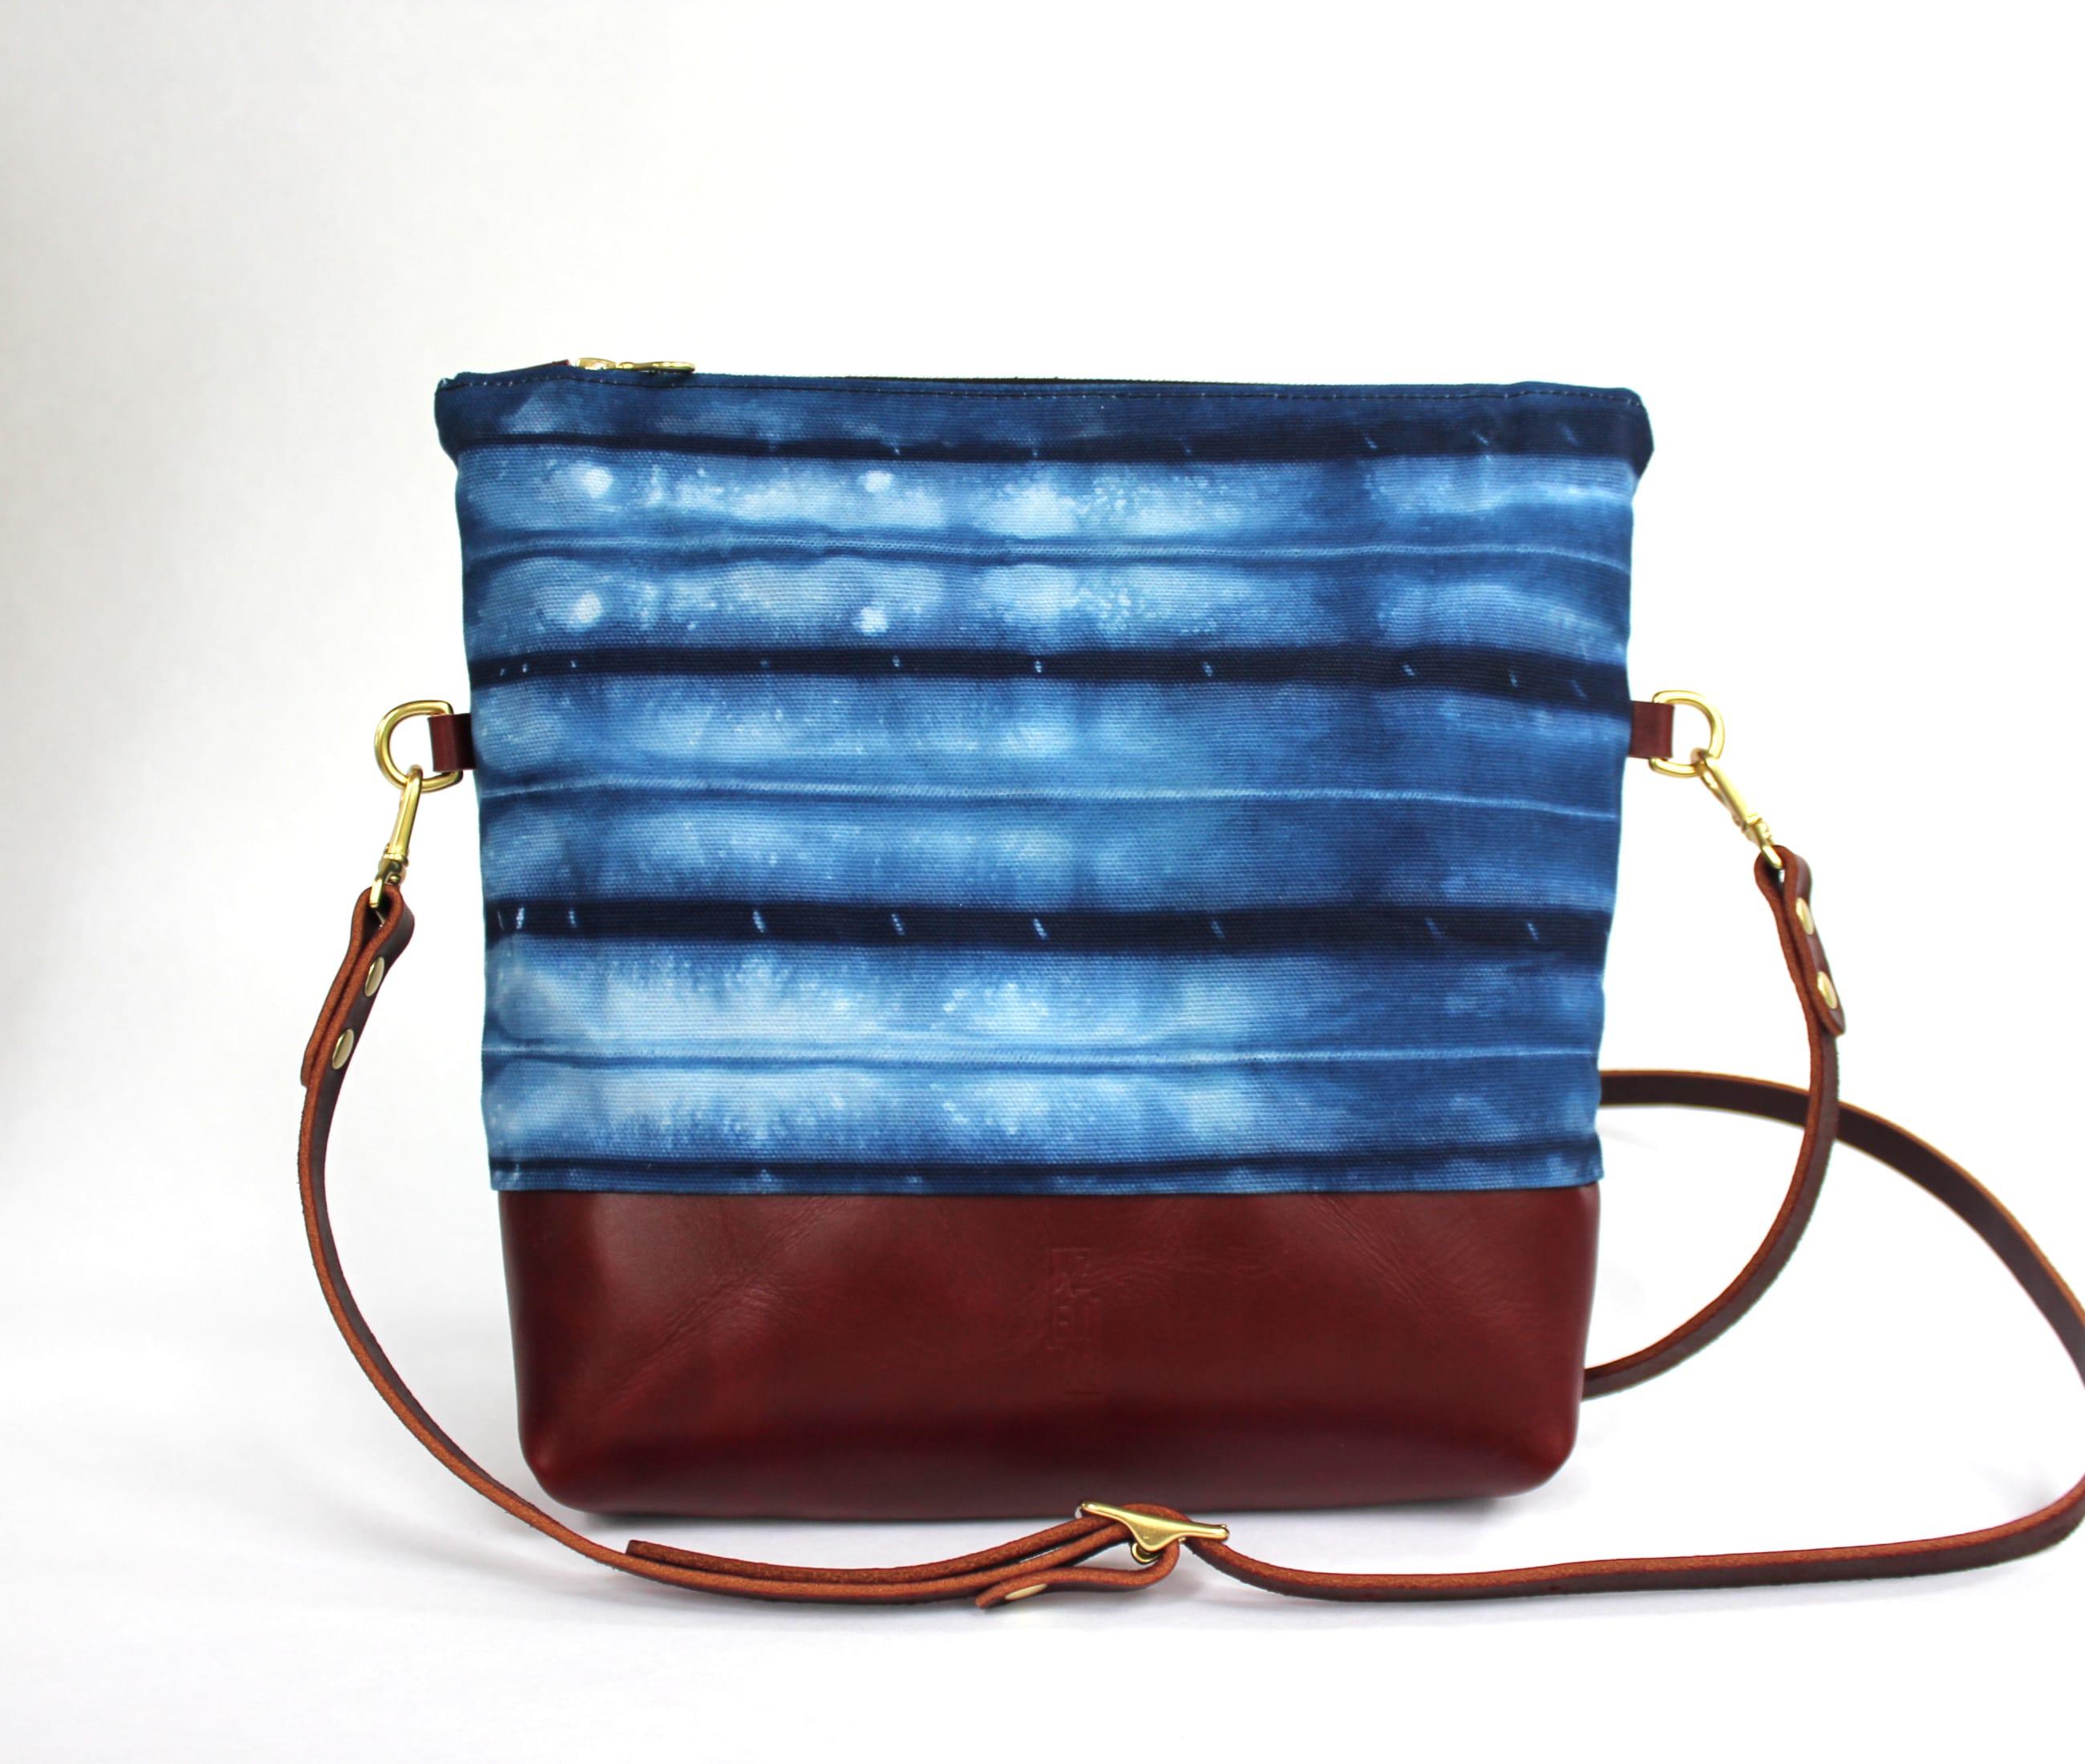 Crossbody indigo shibori white maroon leather front by Azellaz